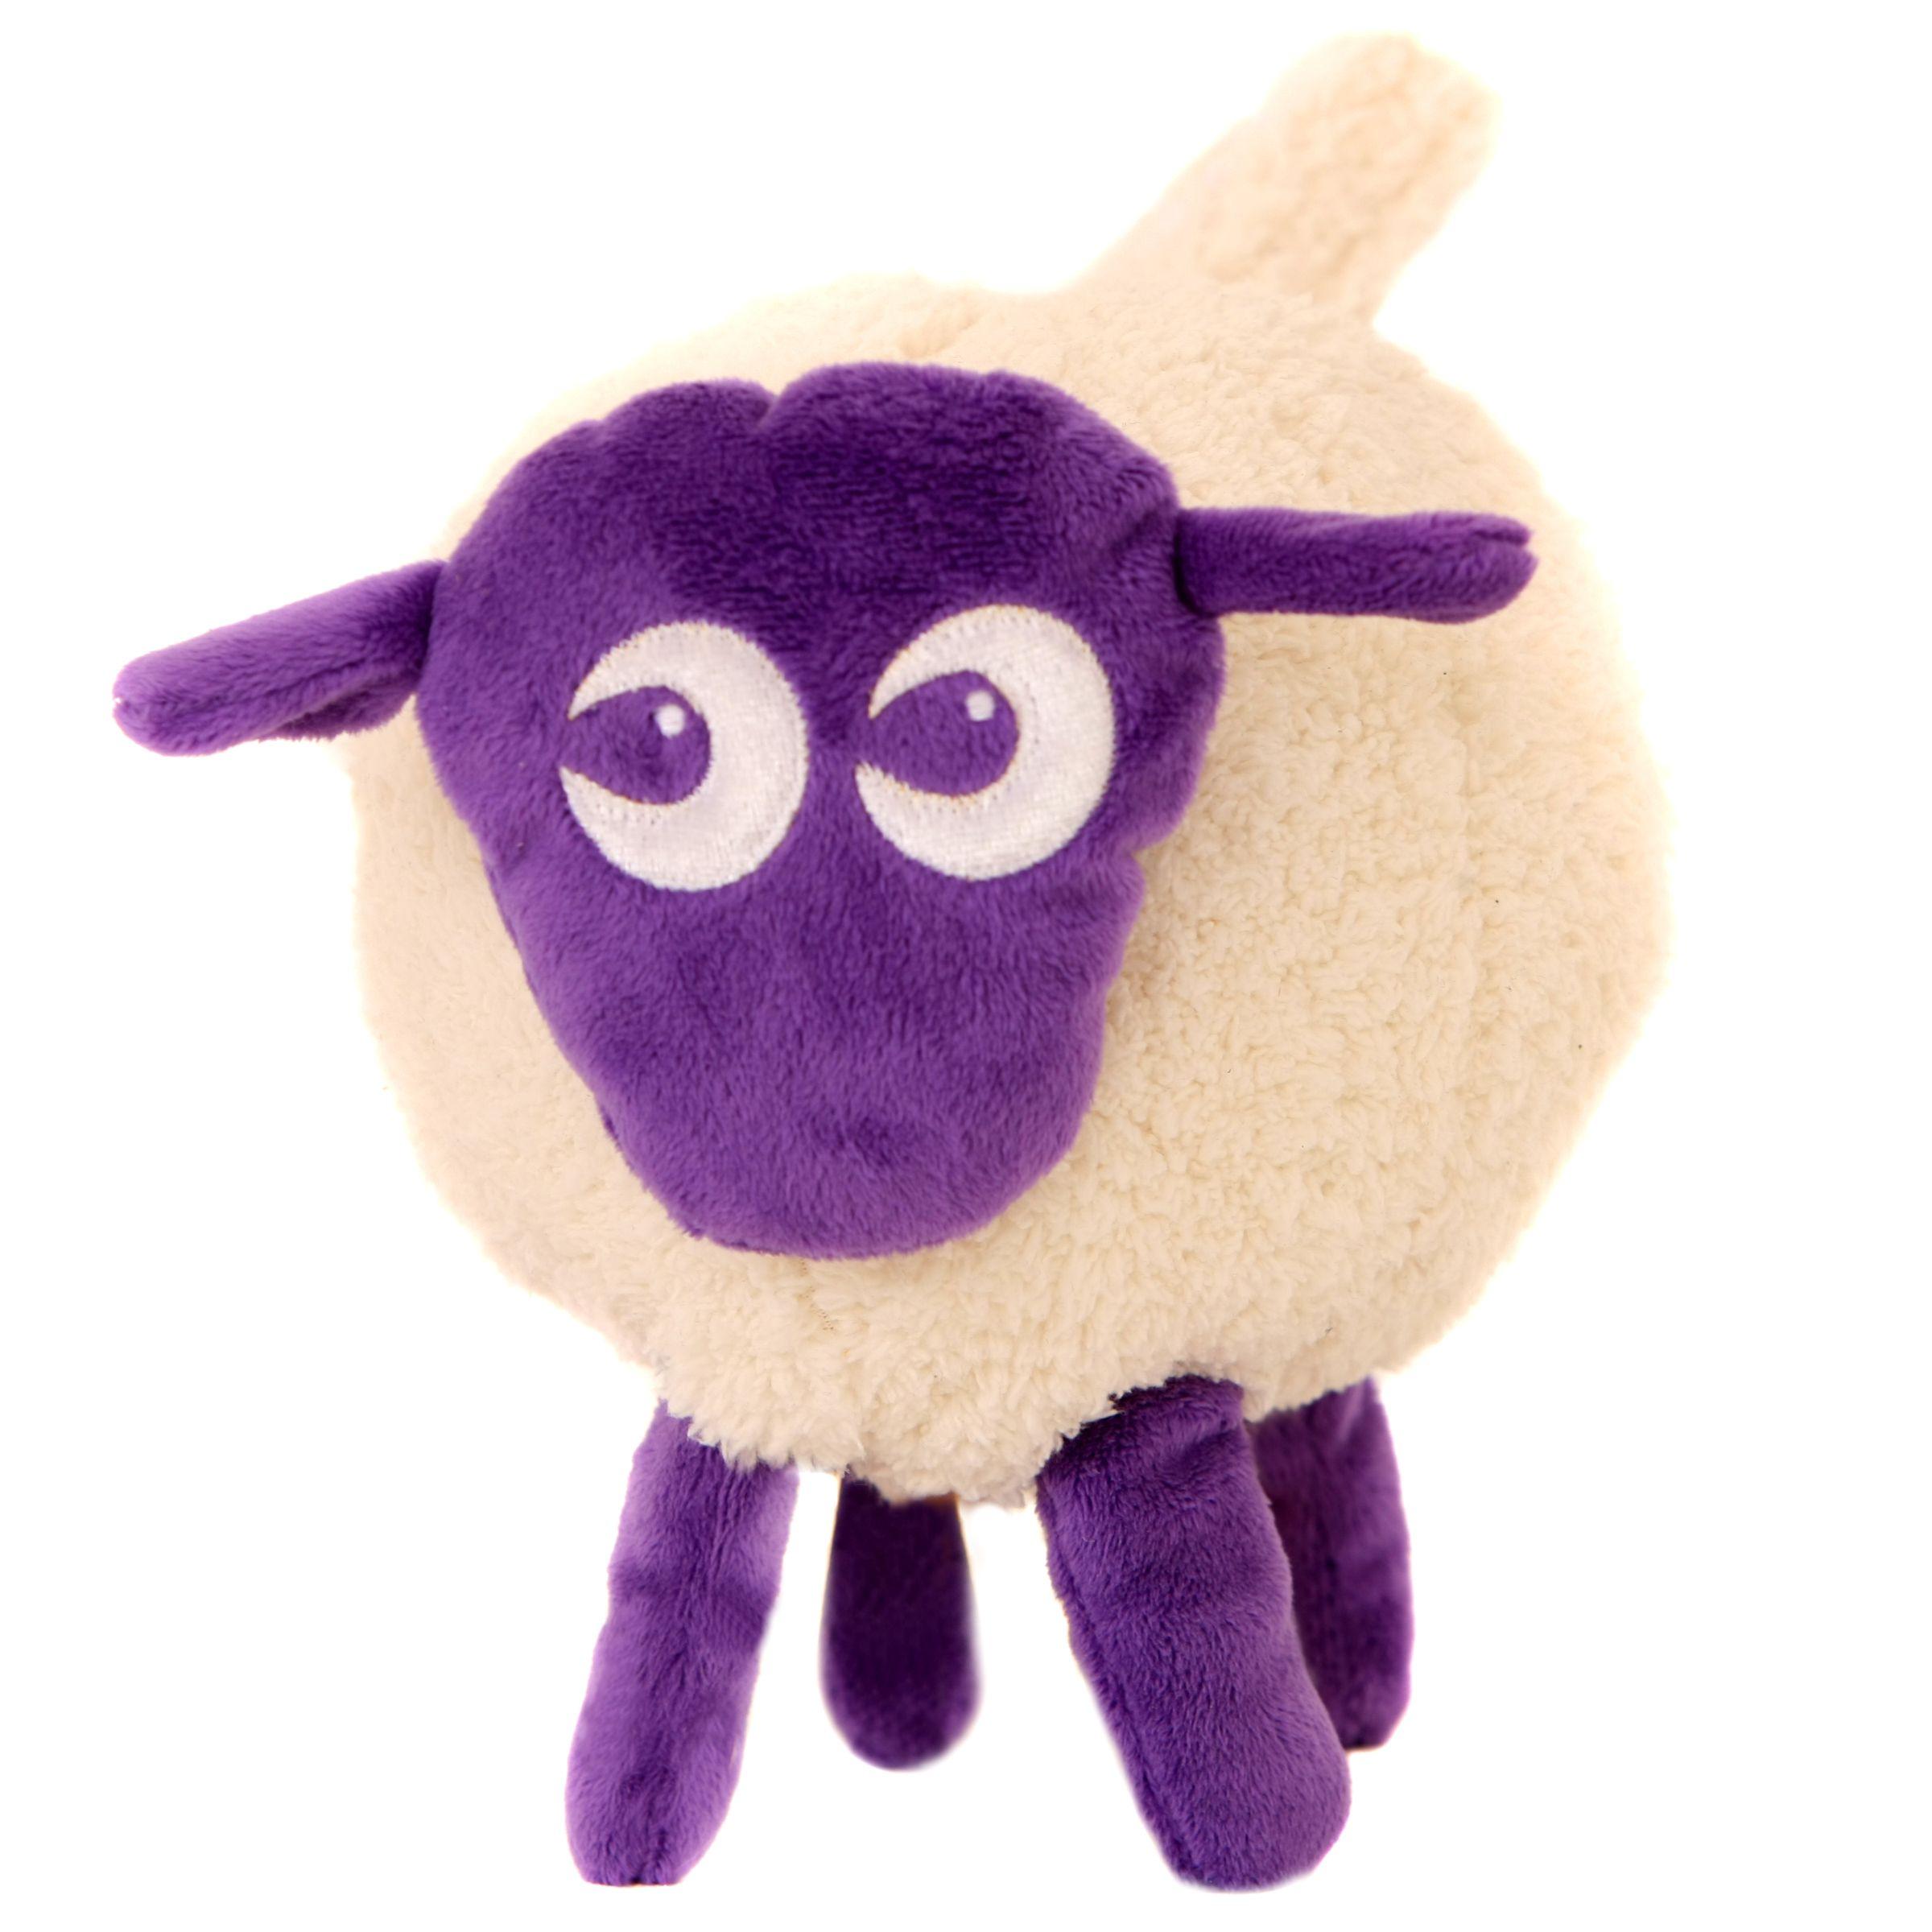 Easidream easidream® Ewan the Dream Sheep